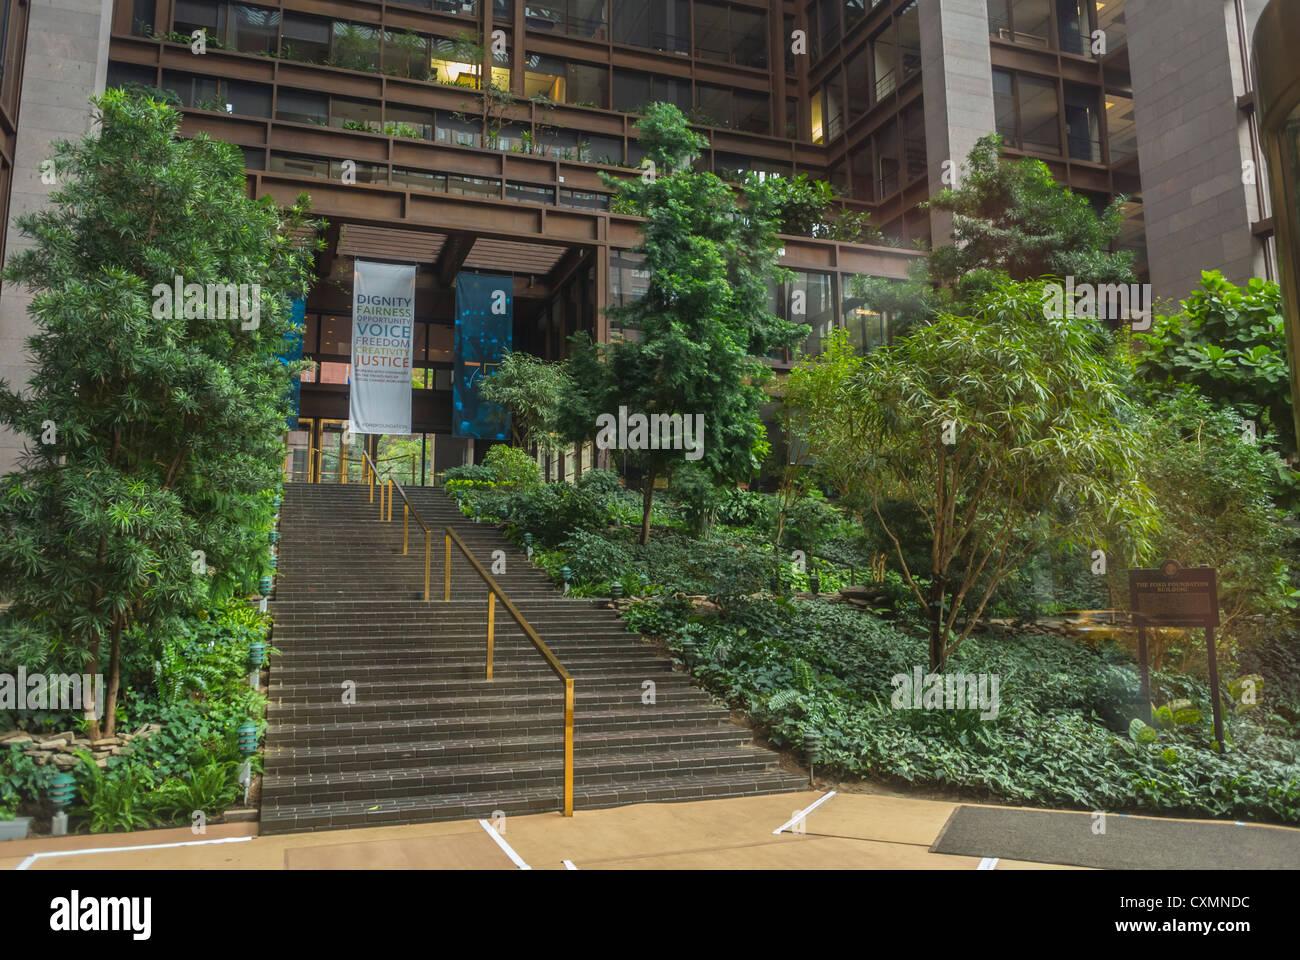 New york ny usa ford foundation building interior garden midtown manhattan